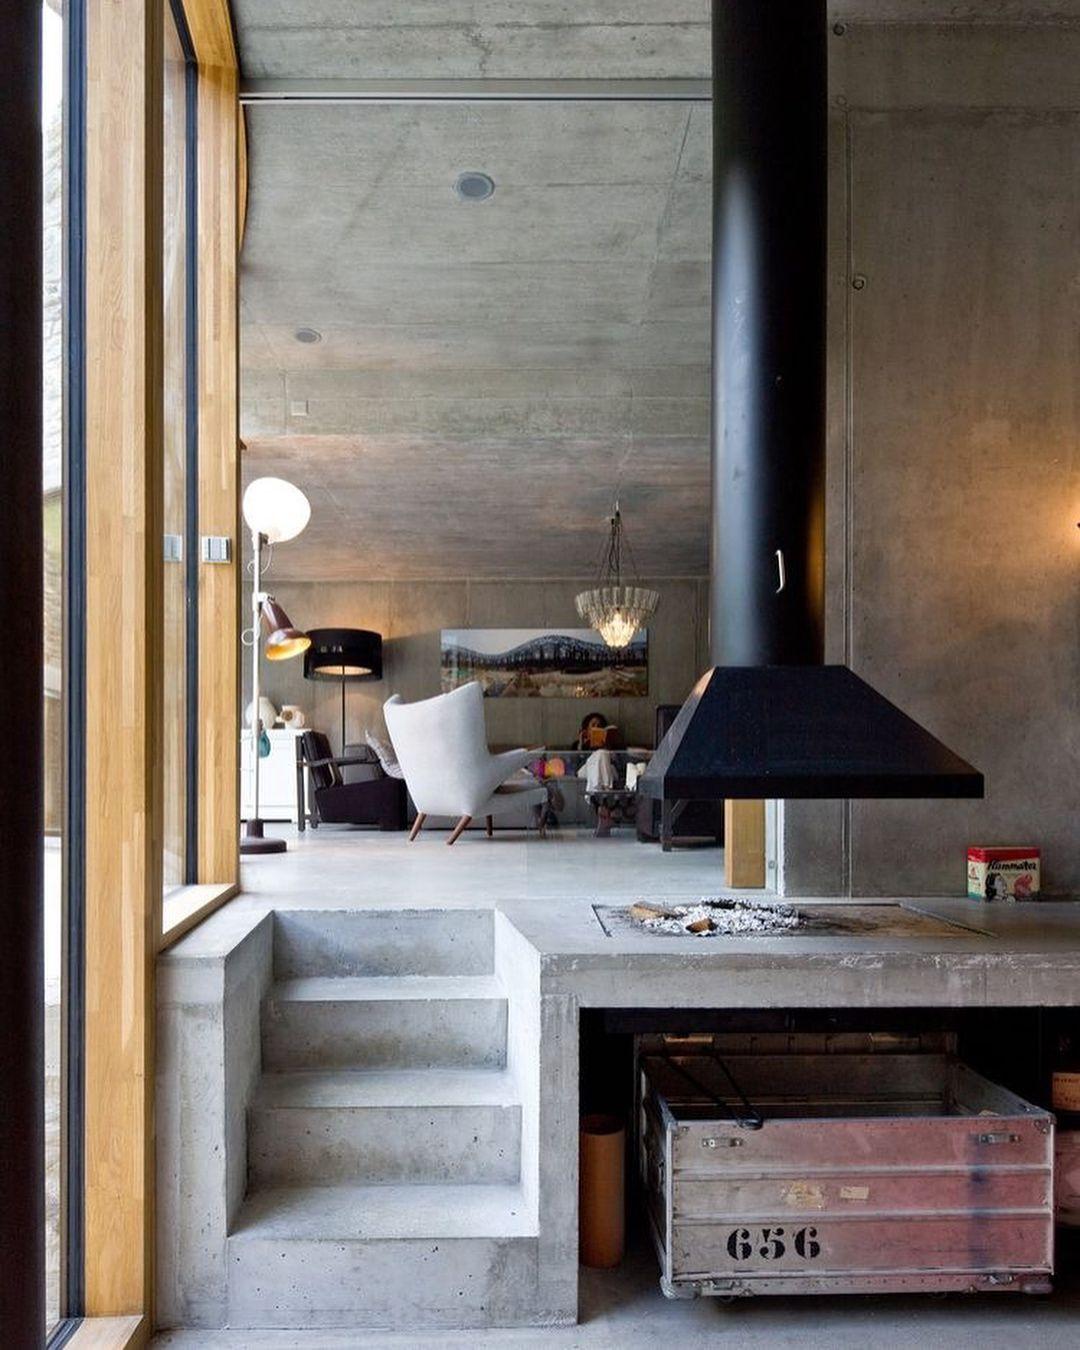 Book Of Interiors Bookofinteriors On Instagram Villa Vals Switzerland By Studio Search Cma Iwan Baan Mor Home Decor Tips Home Unique Home Decor